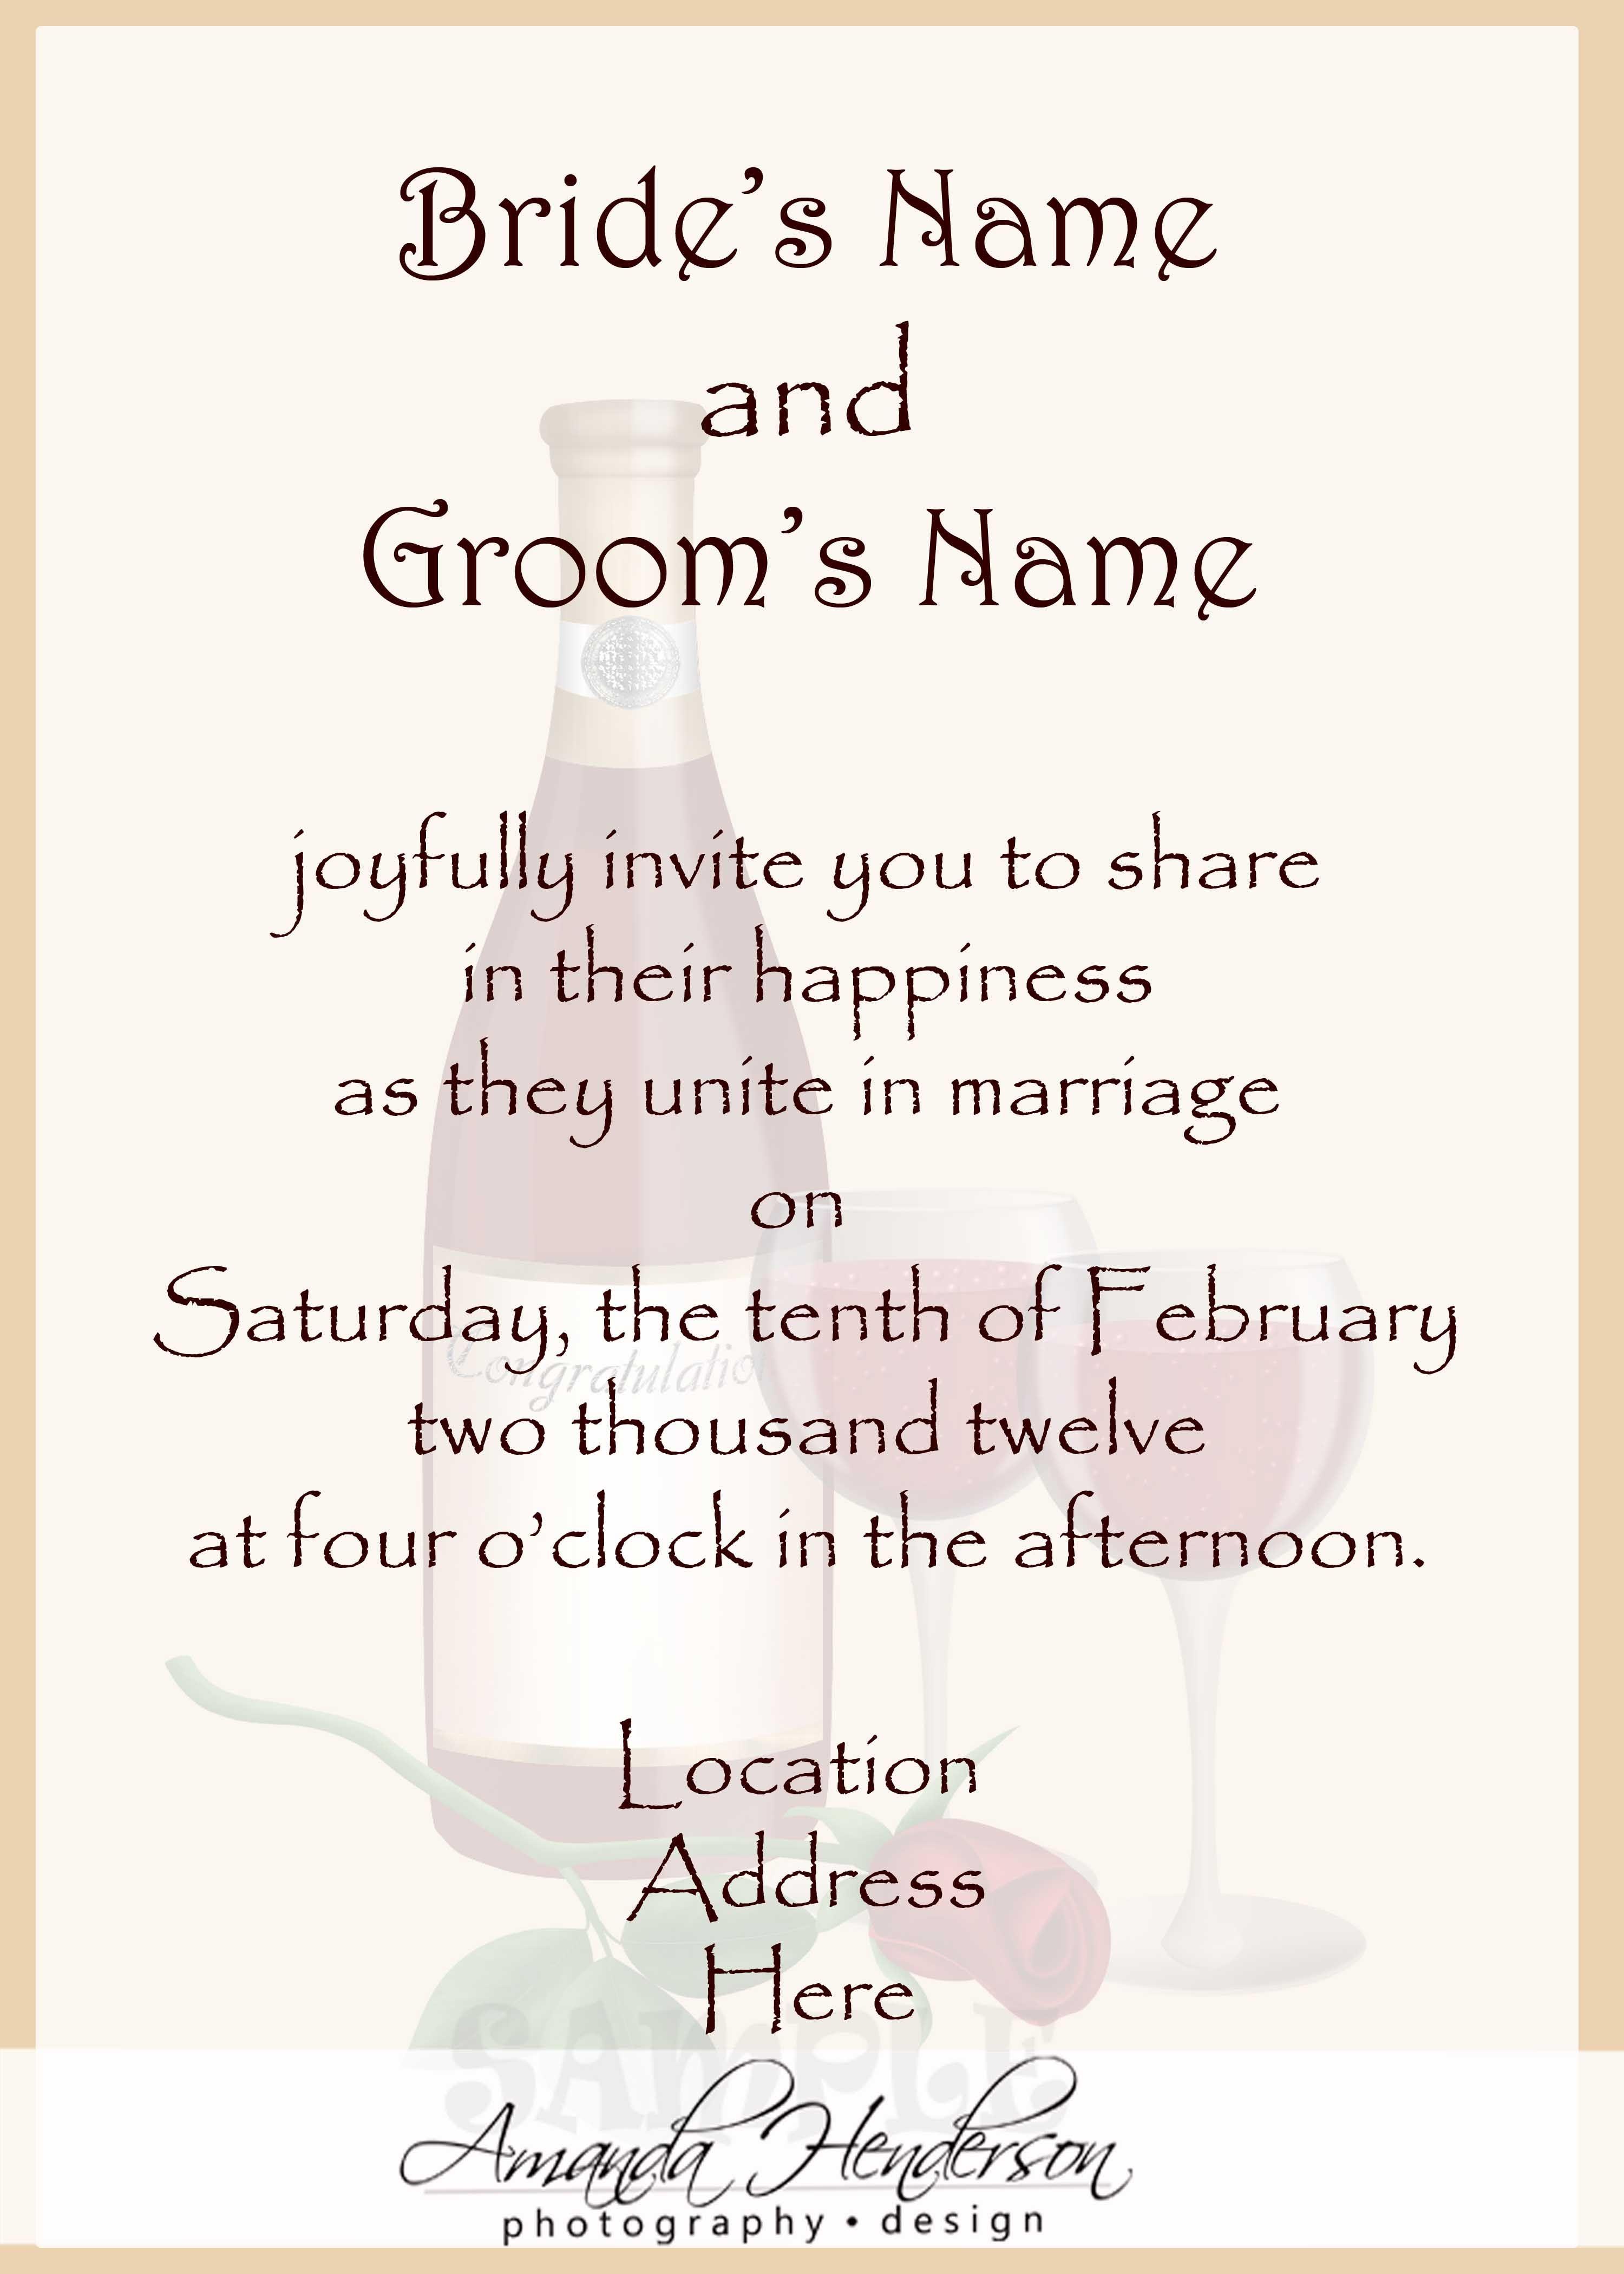 Wedding Invitation Wording Samples 21st, Invitation